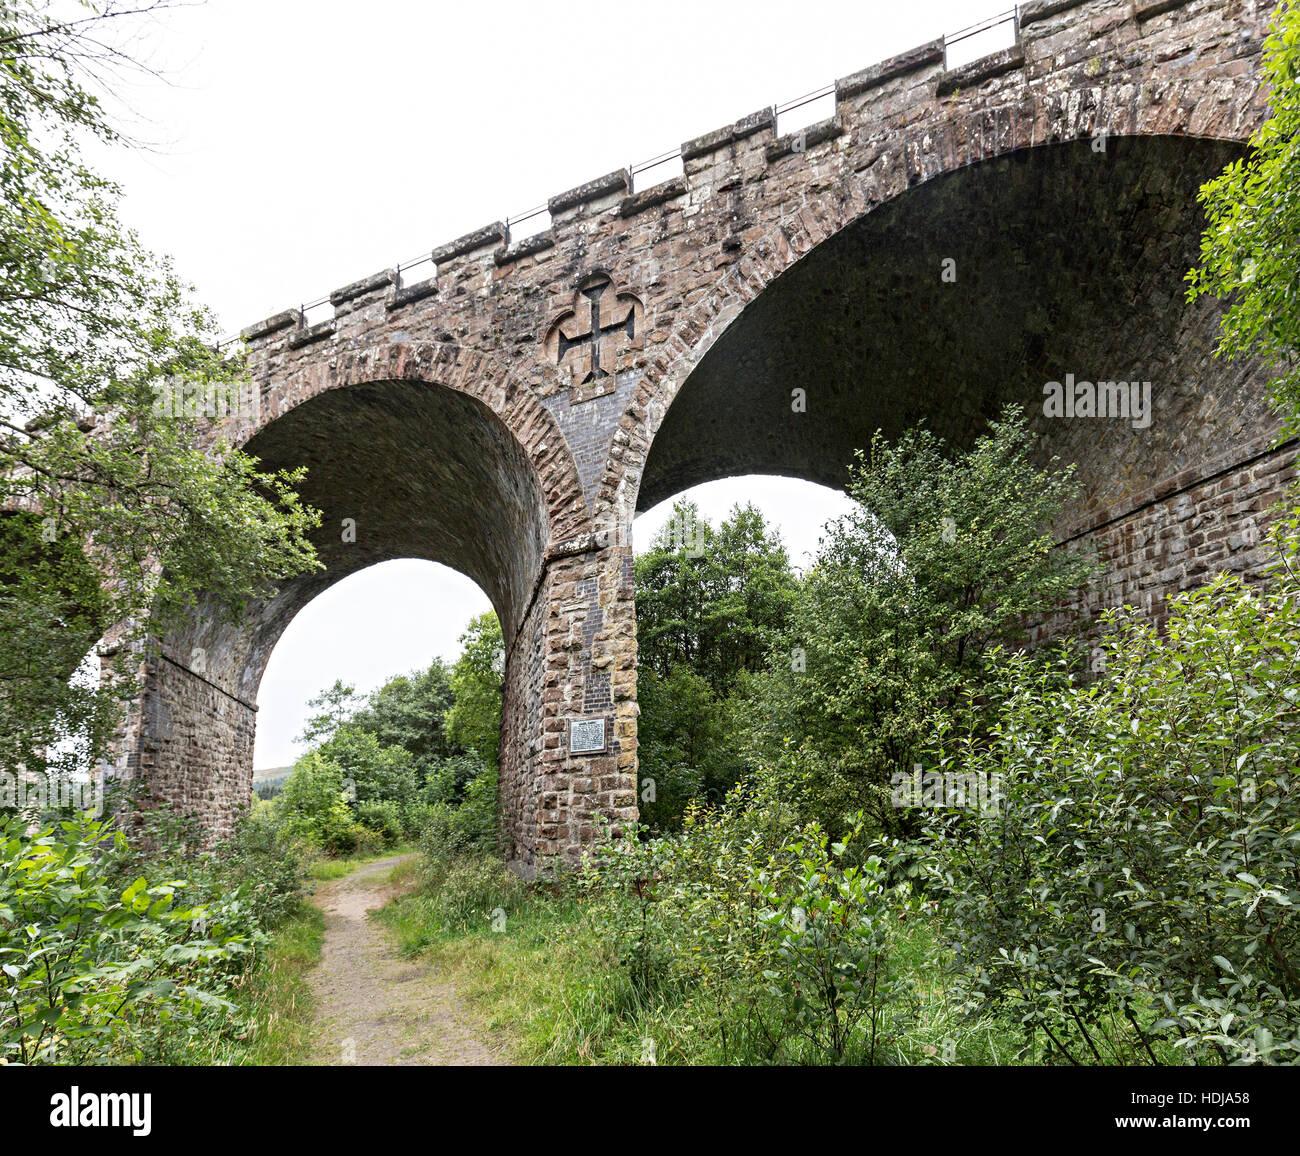 Kielder Railway Viaduct built in 1862 as a seven skew arch brudge, Northumberland, England, UK - Stock Image